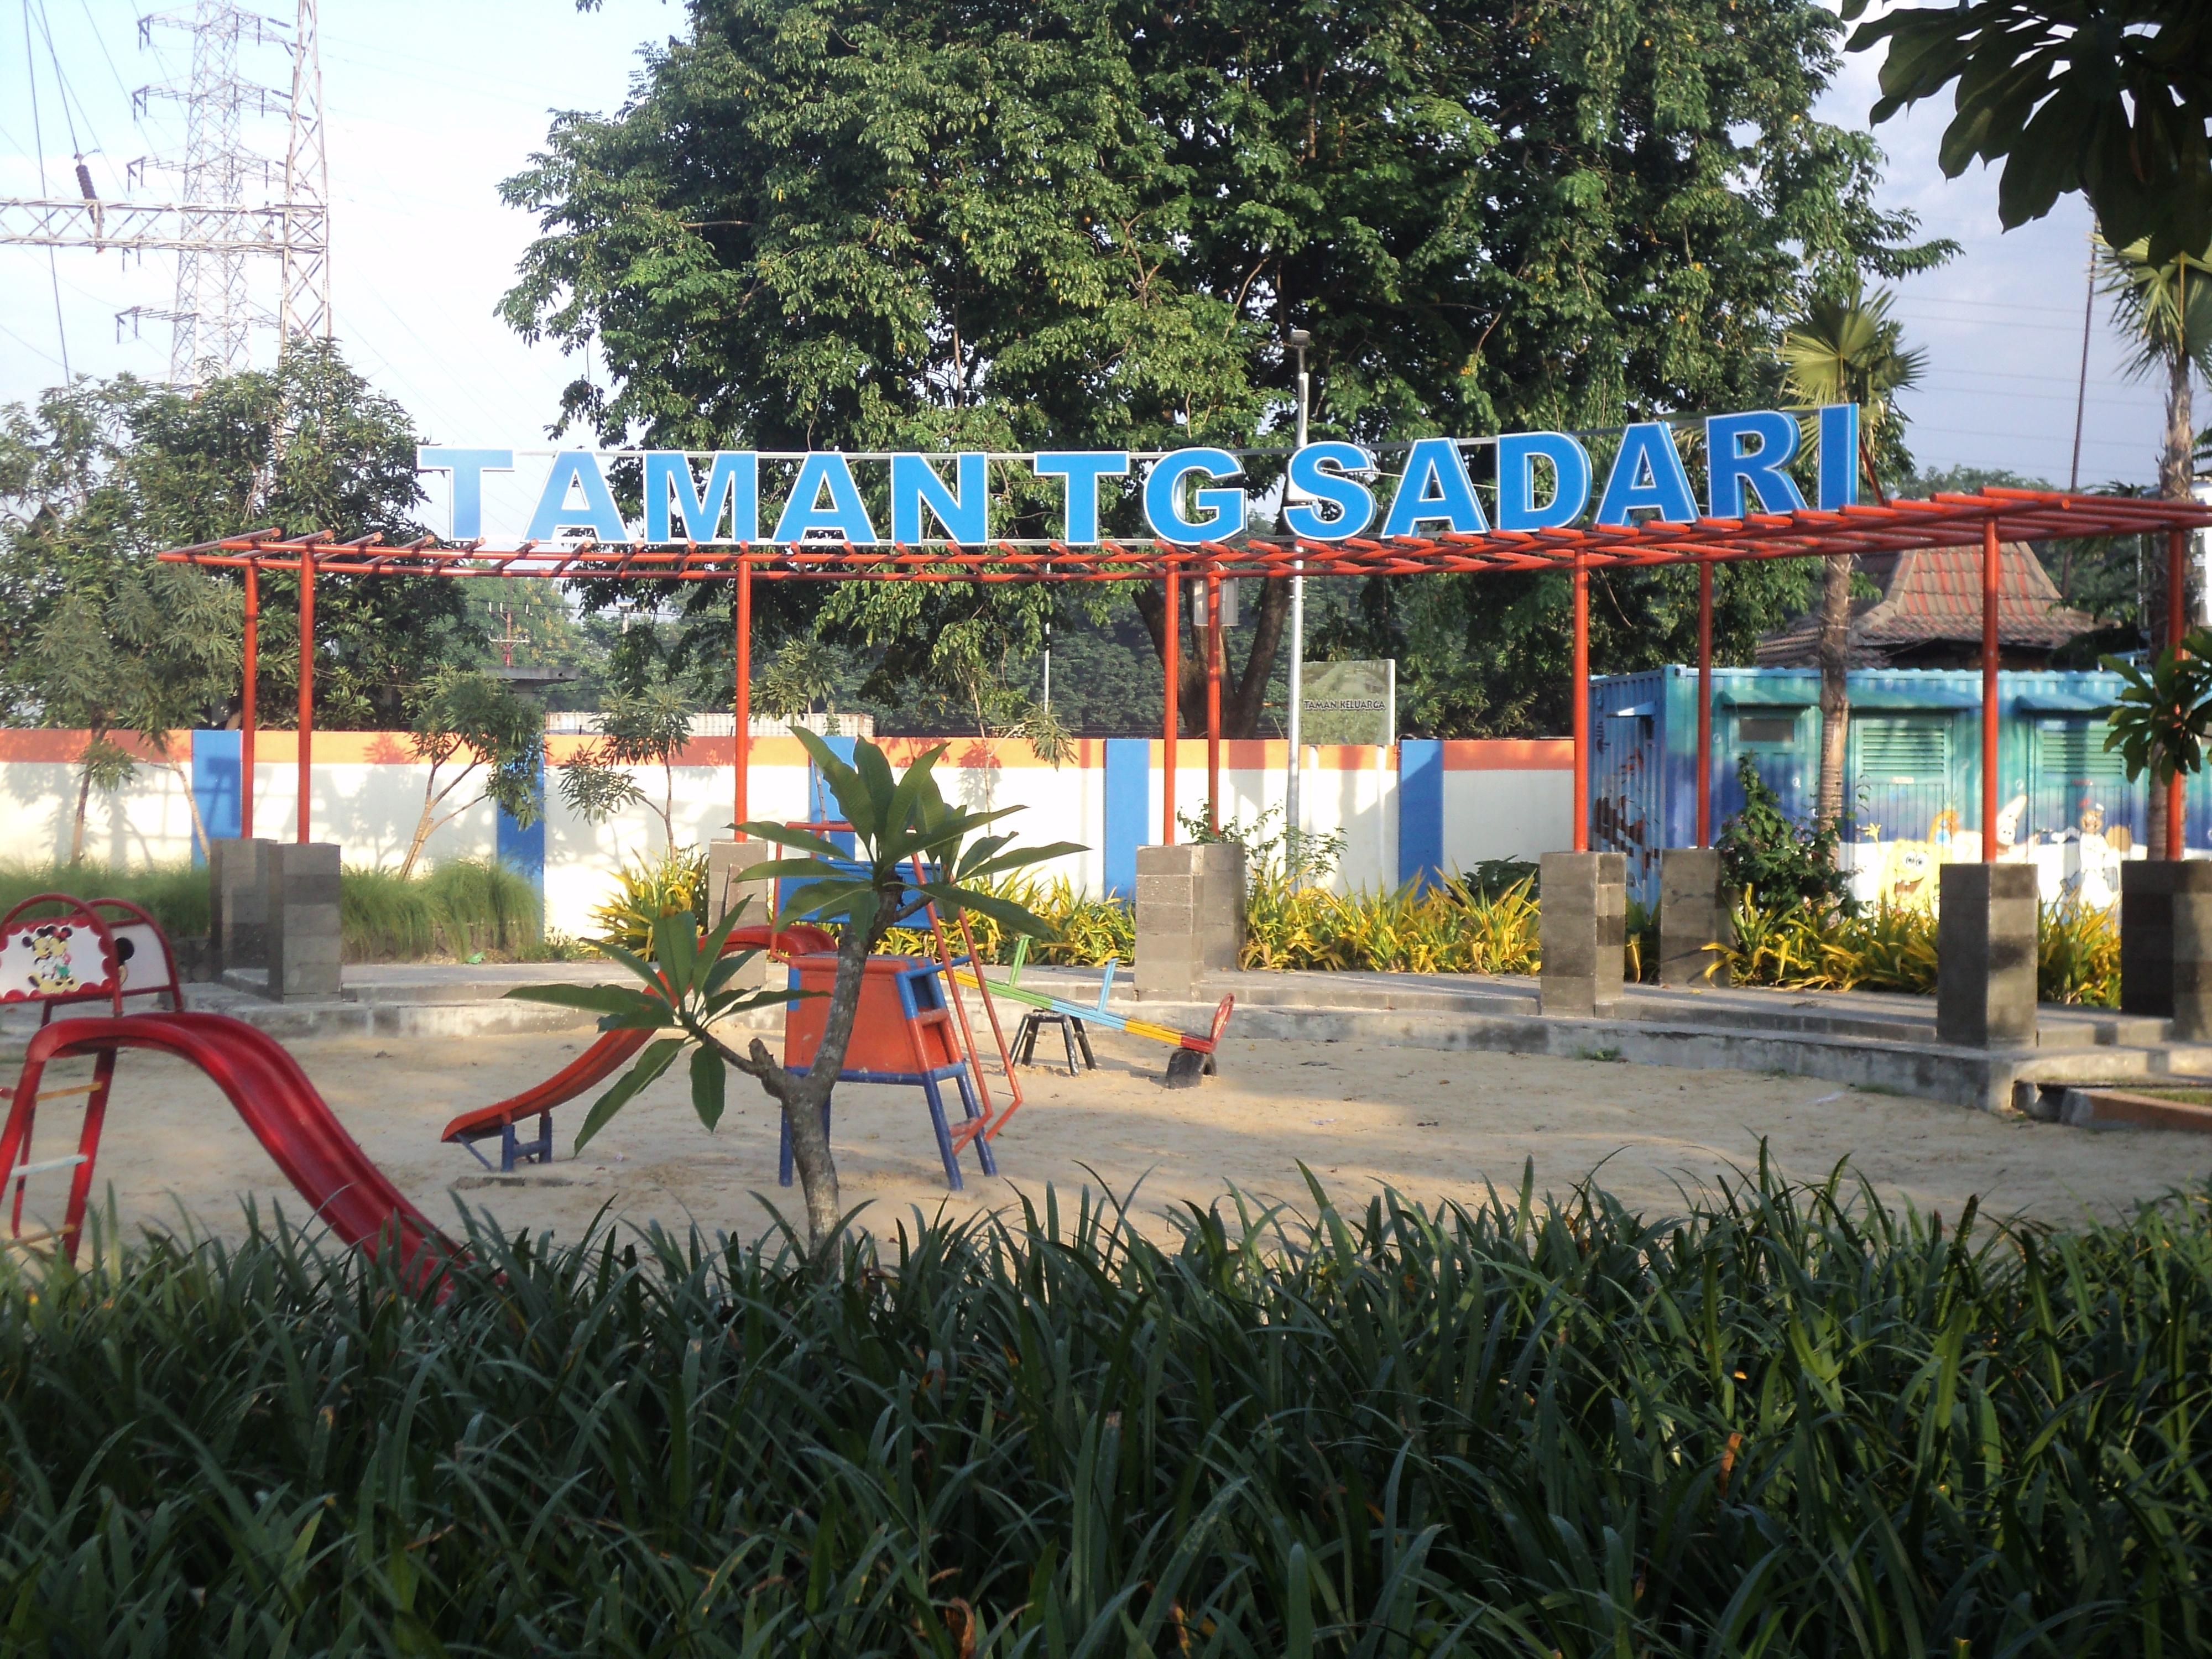 Taman Surabaya Pesona Kota Tanjung Sadari Buah Undaan